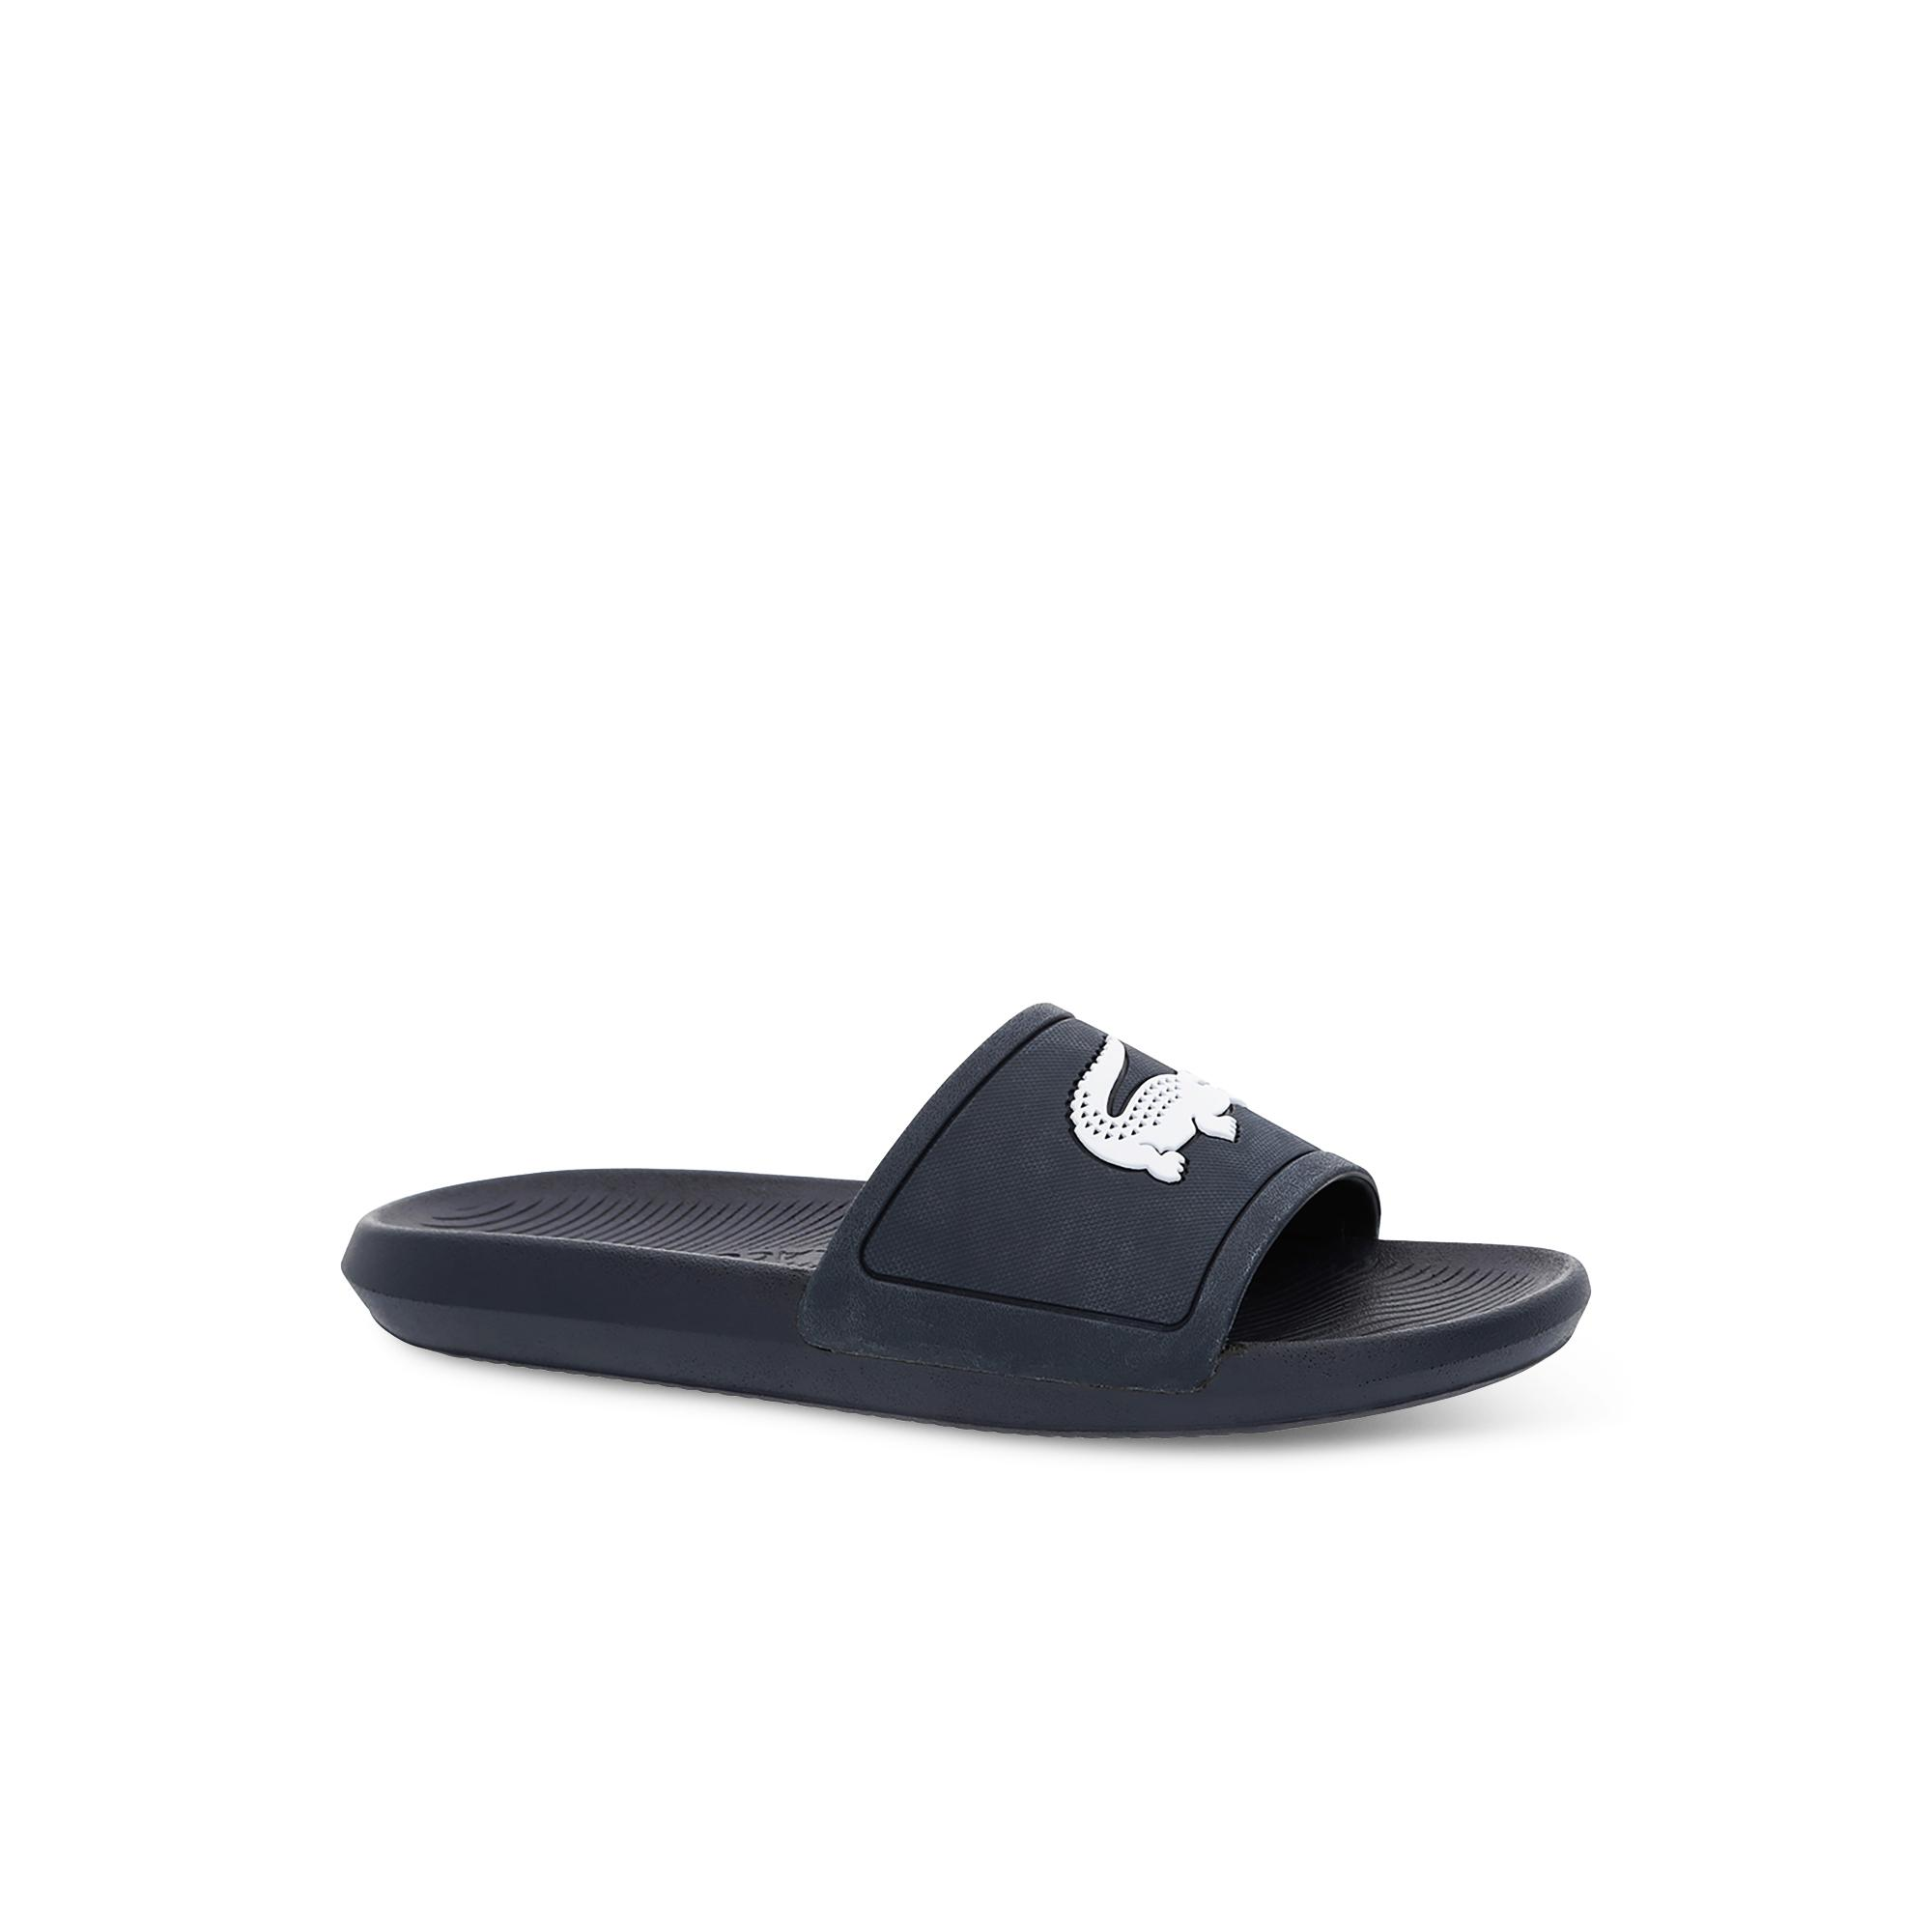 Lacoste Croco Slide 119 1 Men's Slides